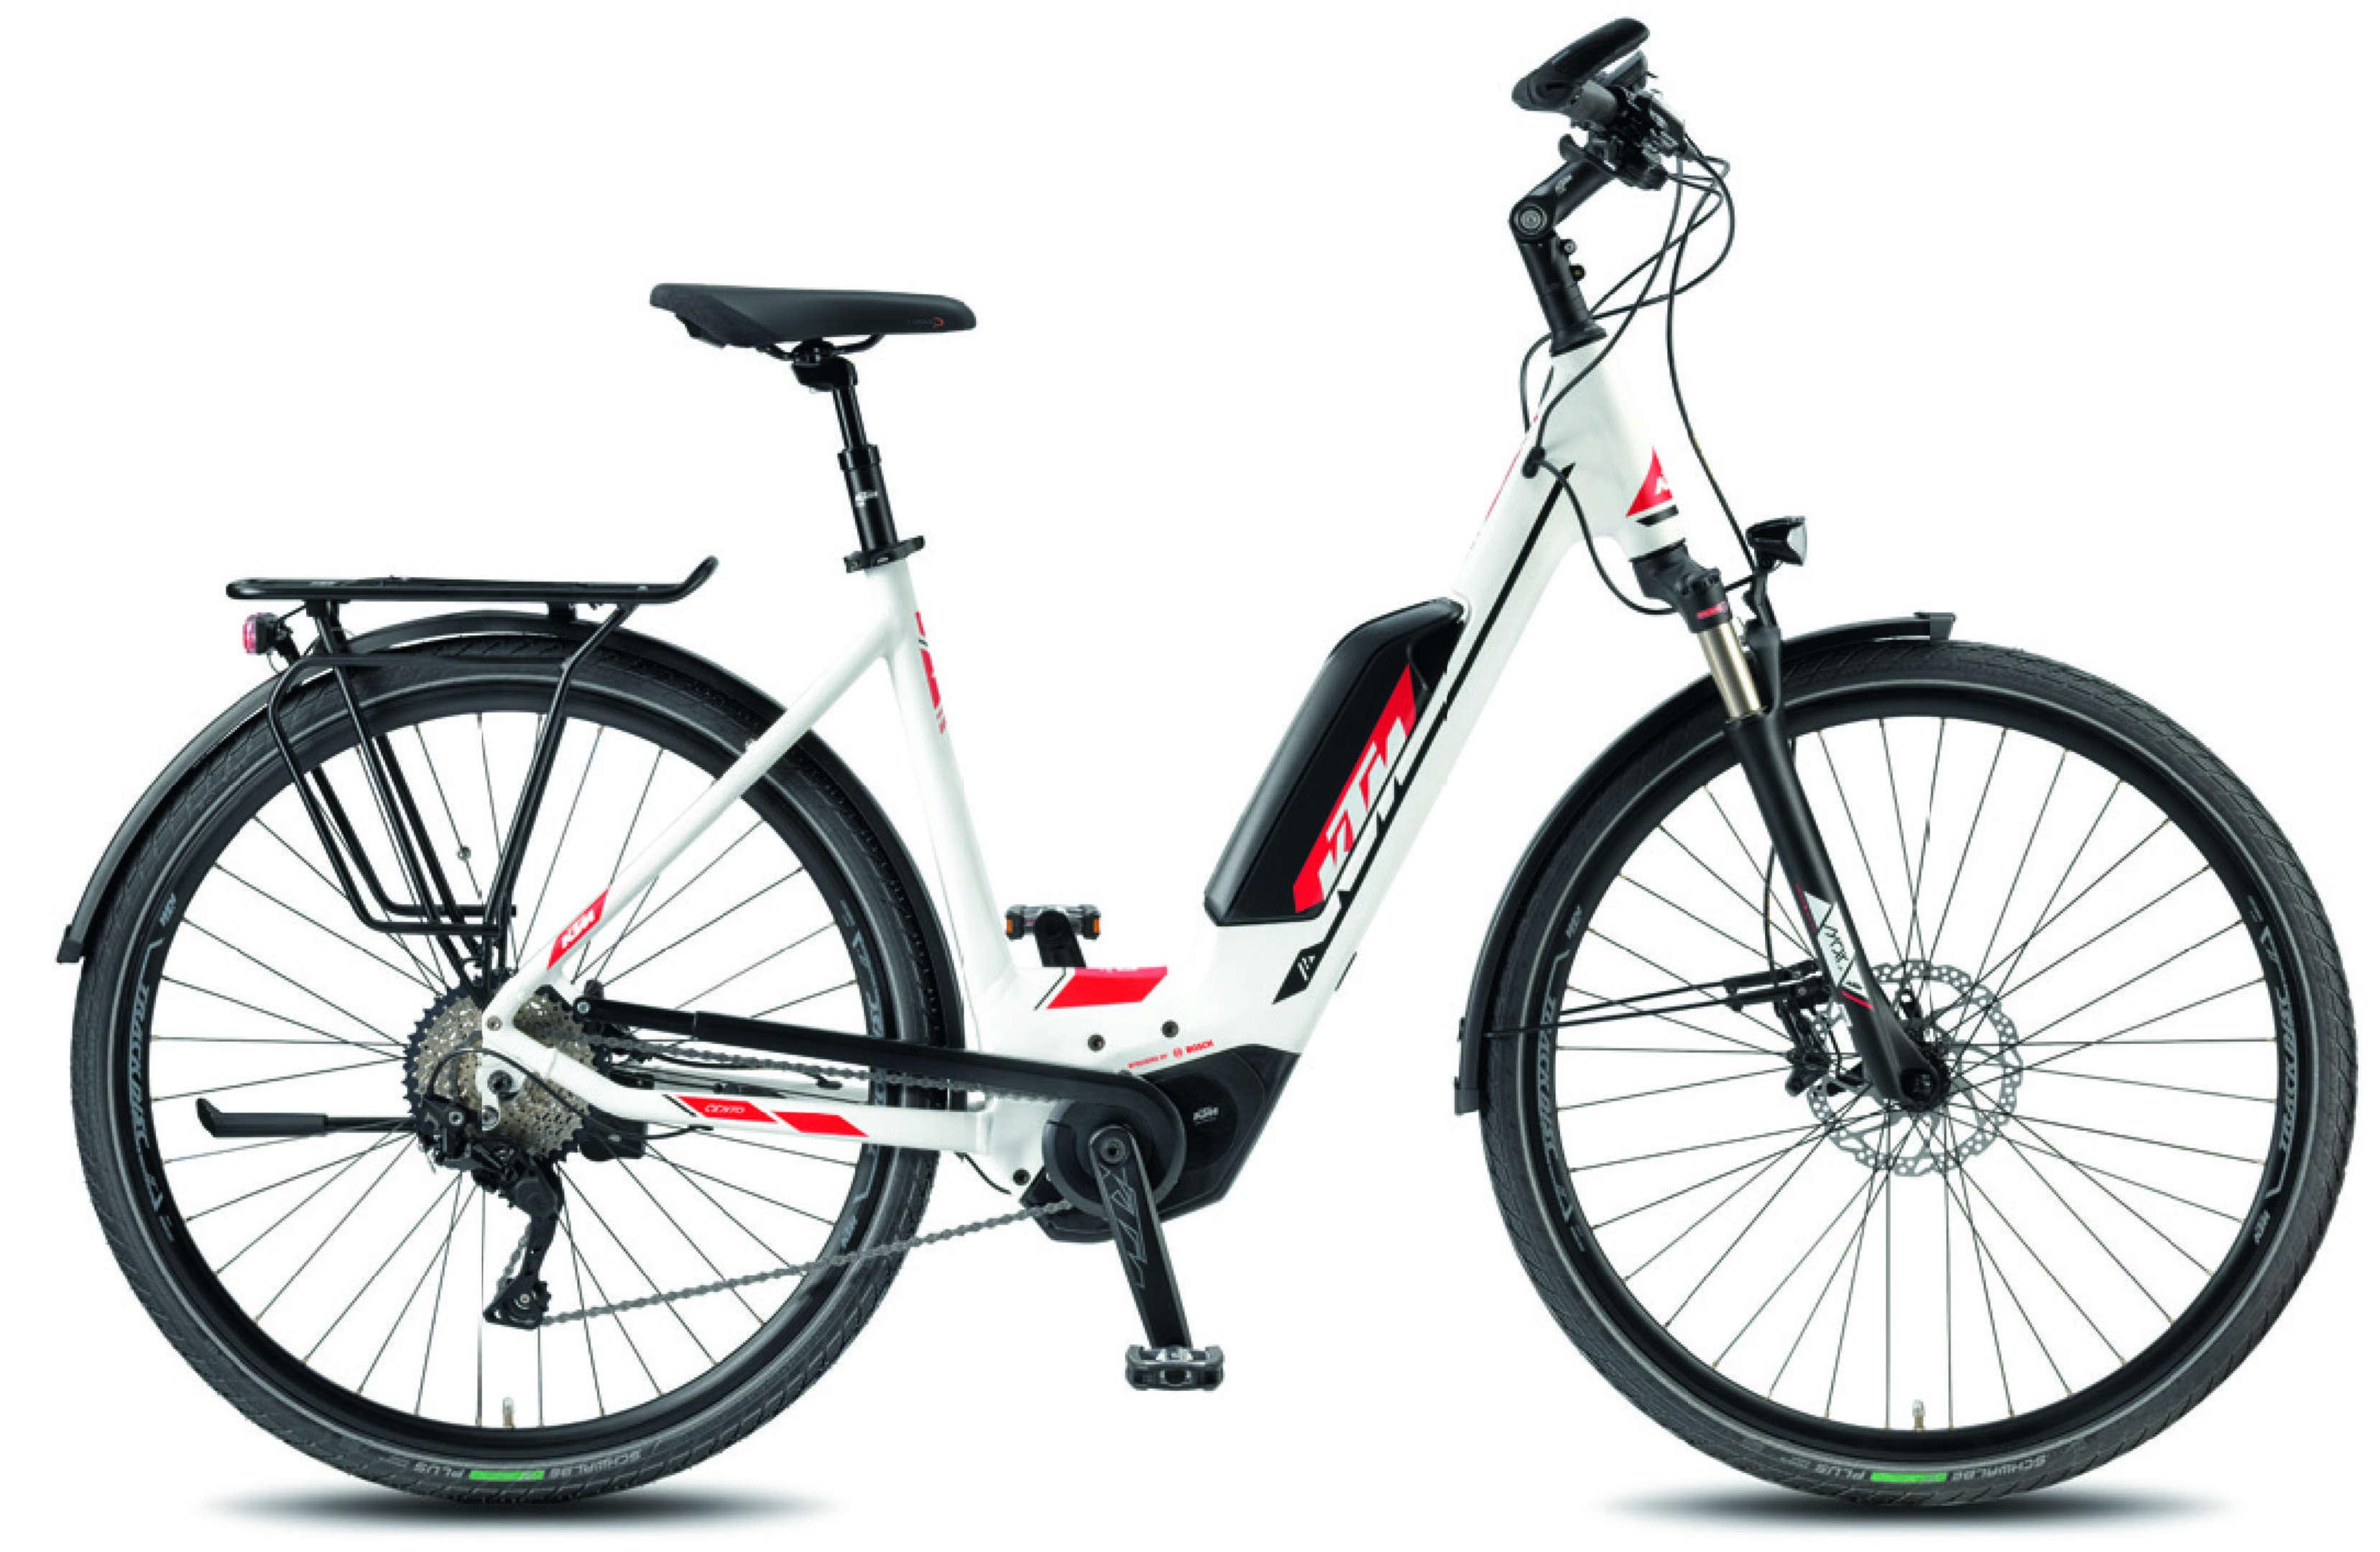 ktm e bike cento 10 cx5 eurorad bikeleasingeurorad. Black Bedroom Furniture Sets. Home Design Ideas